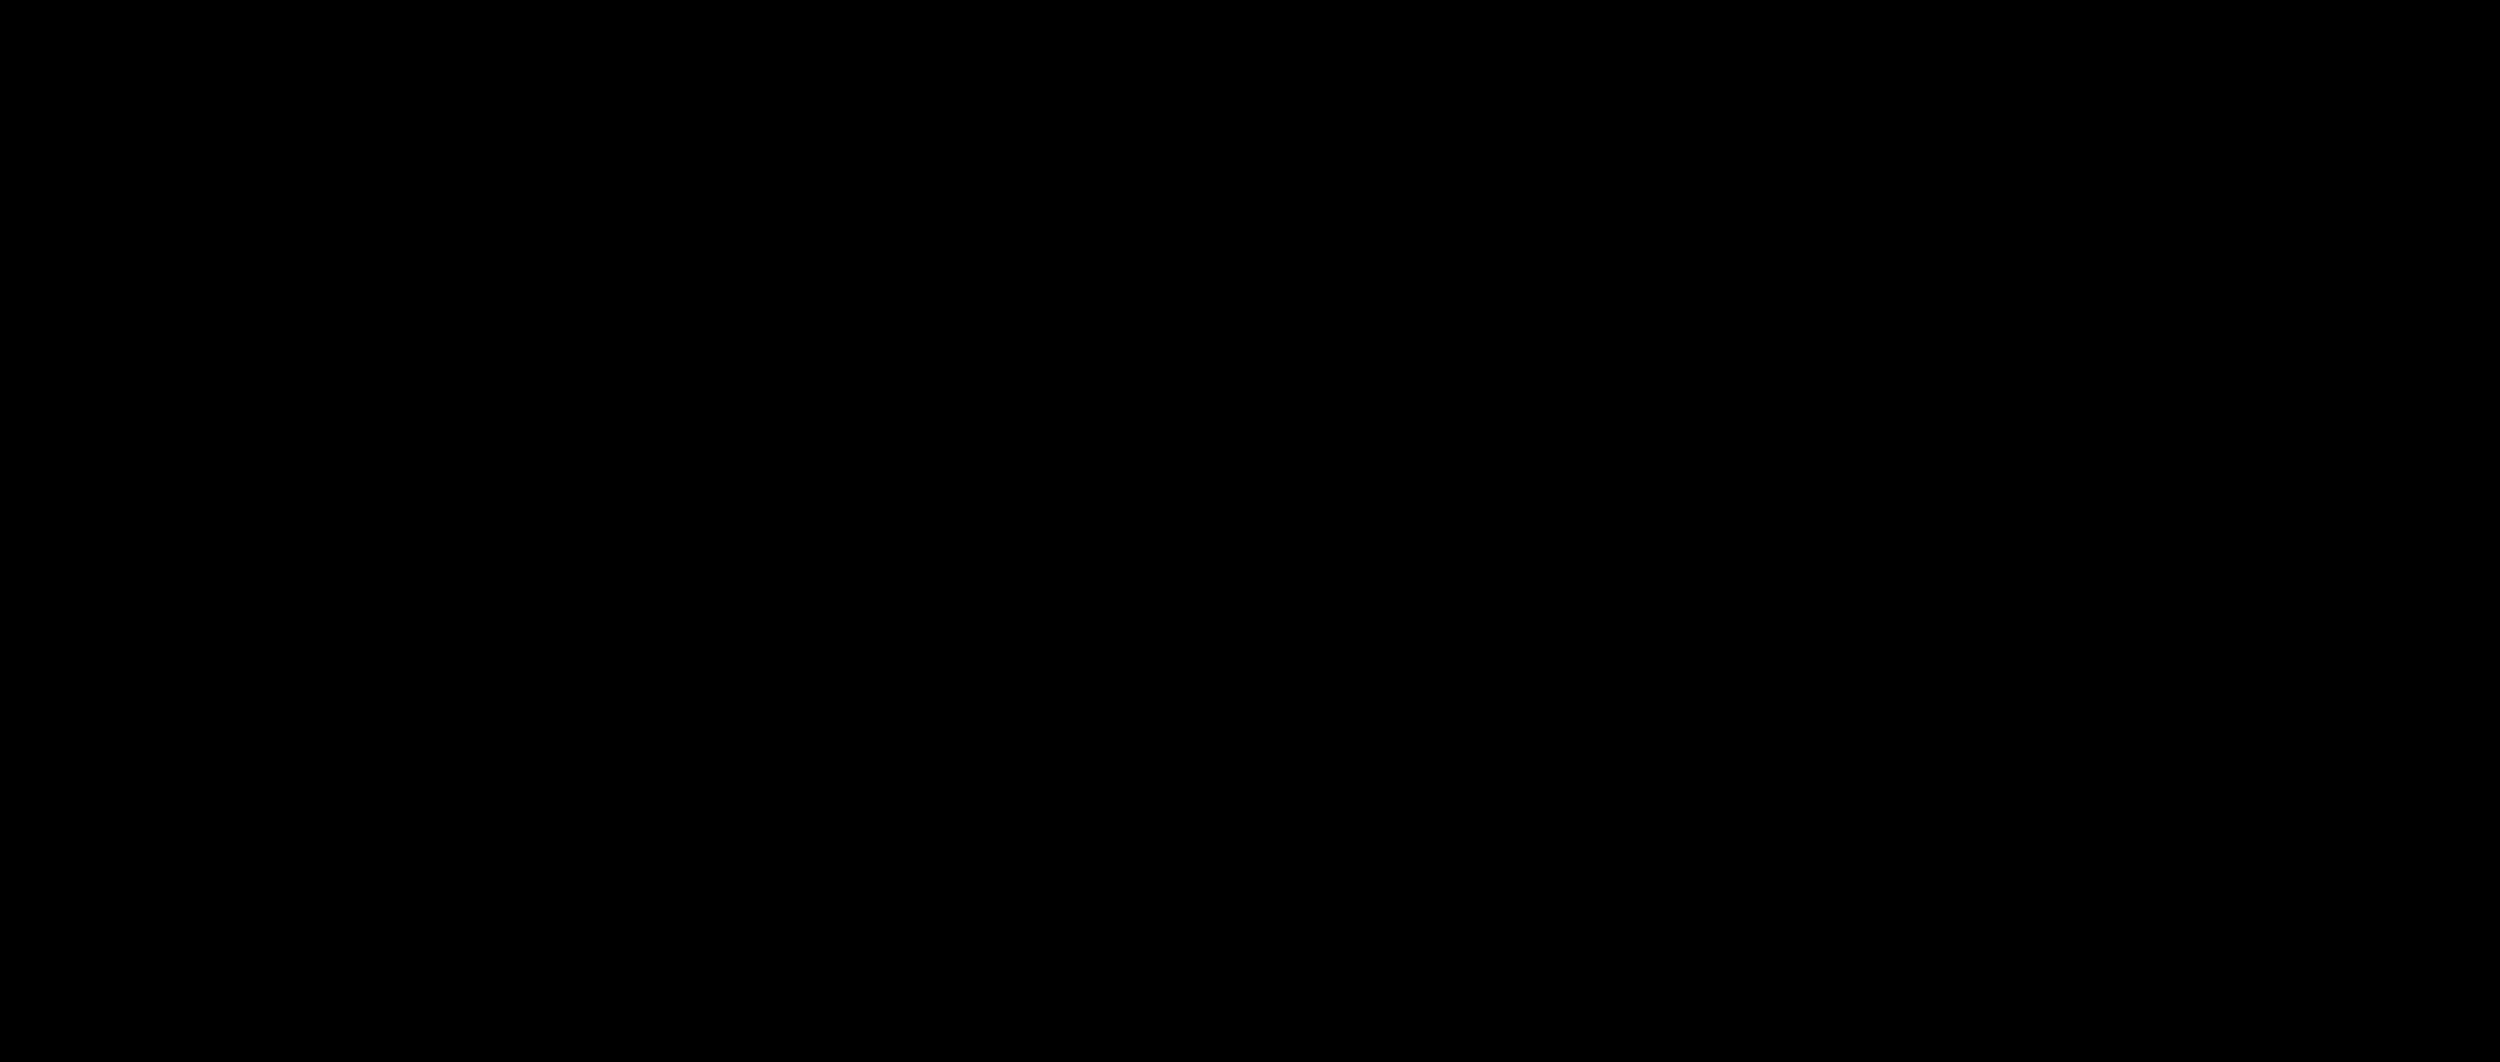 logo-rect-black (1).png